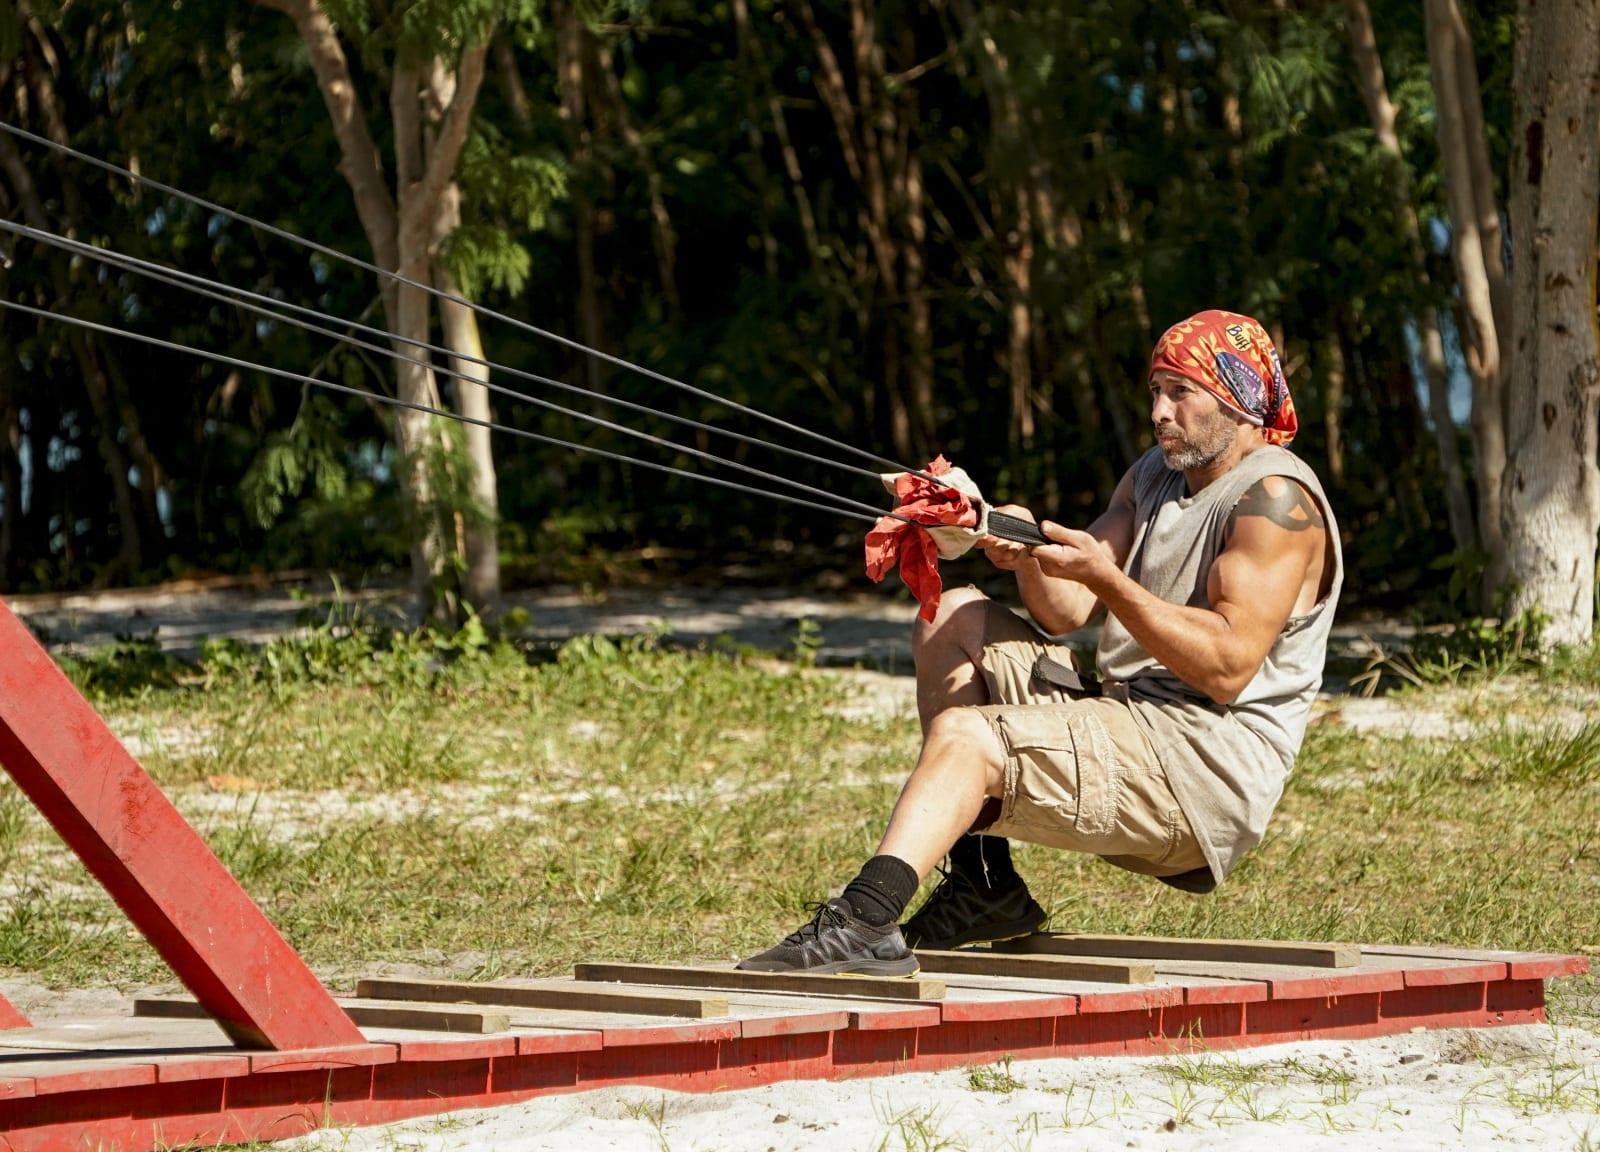 Tony Vlachos Survivor Winners at War episode 7